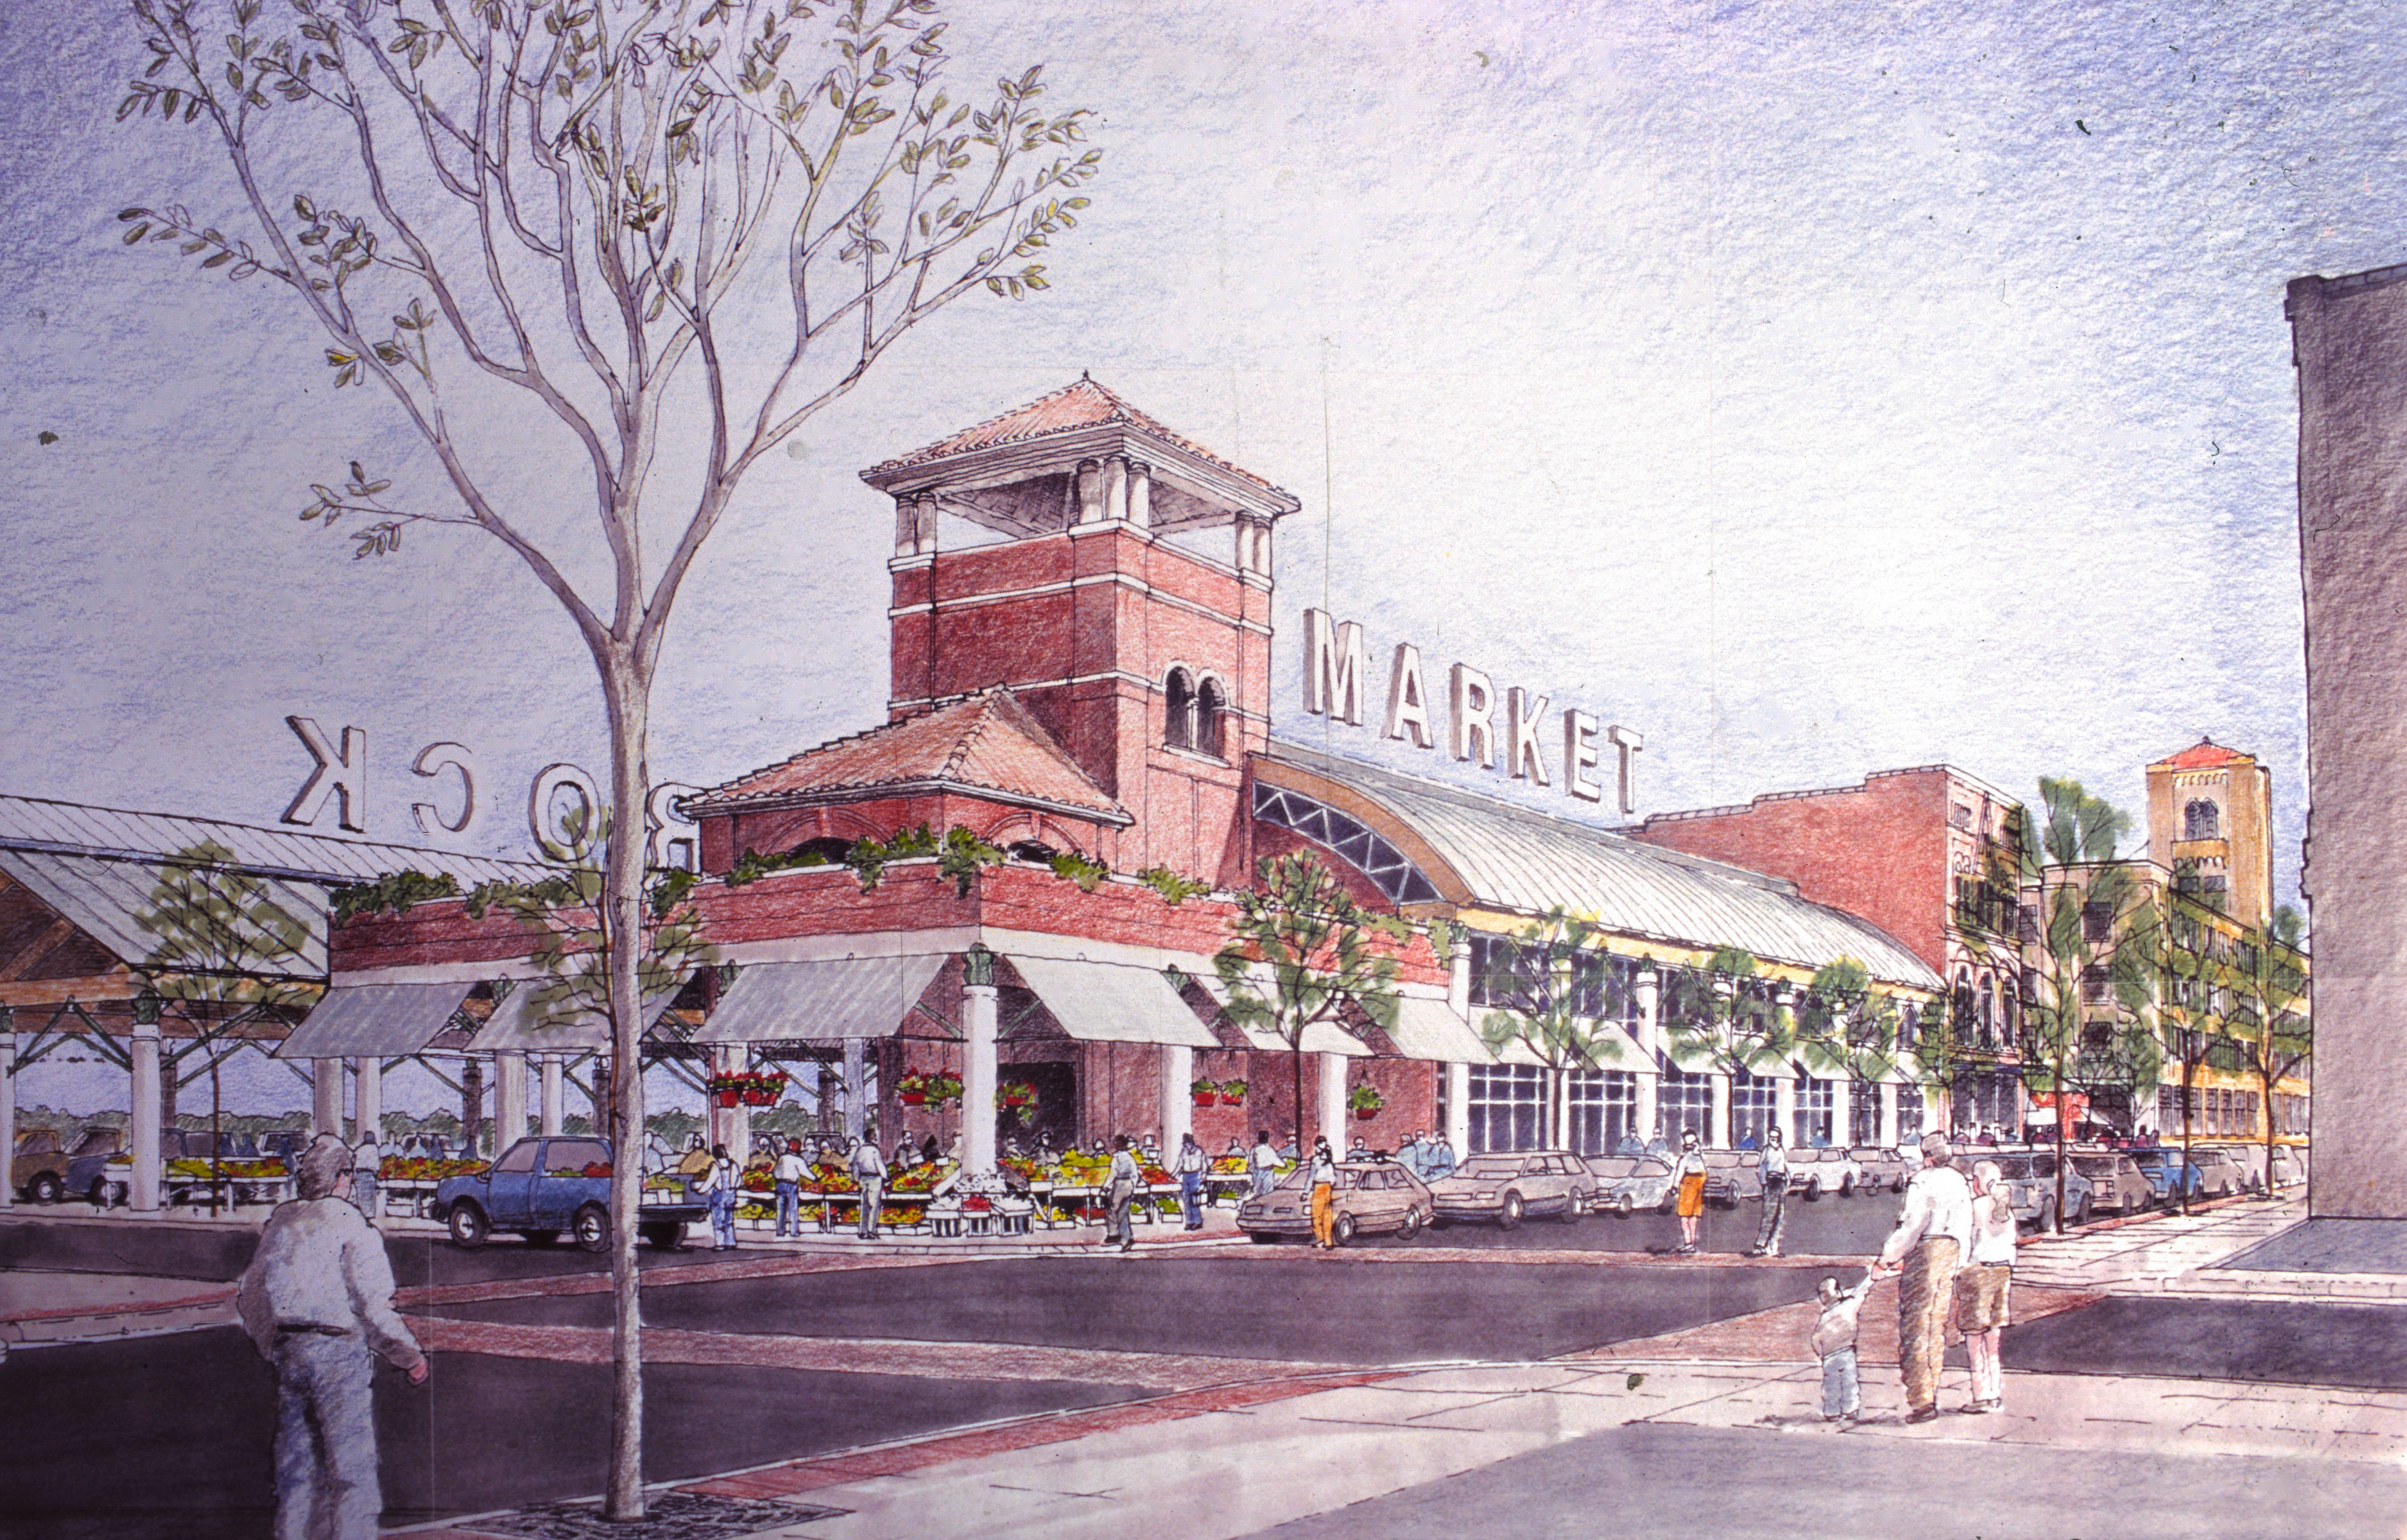 The River Market